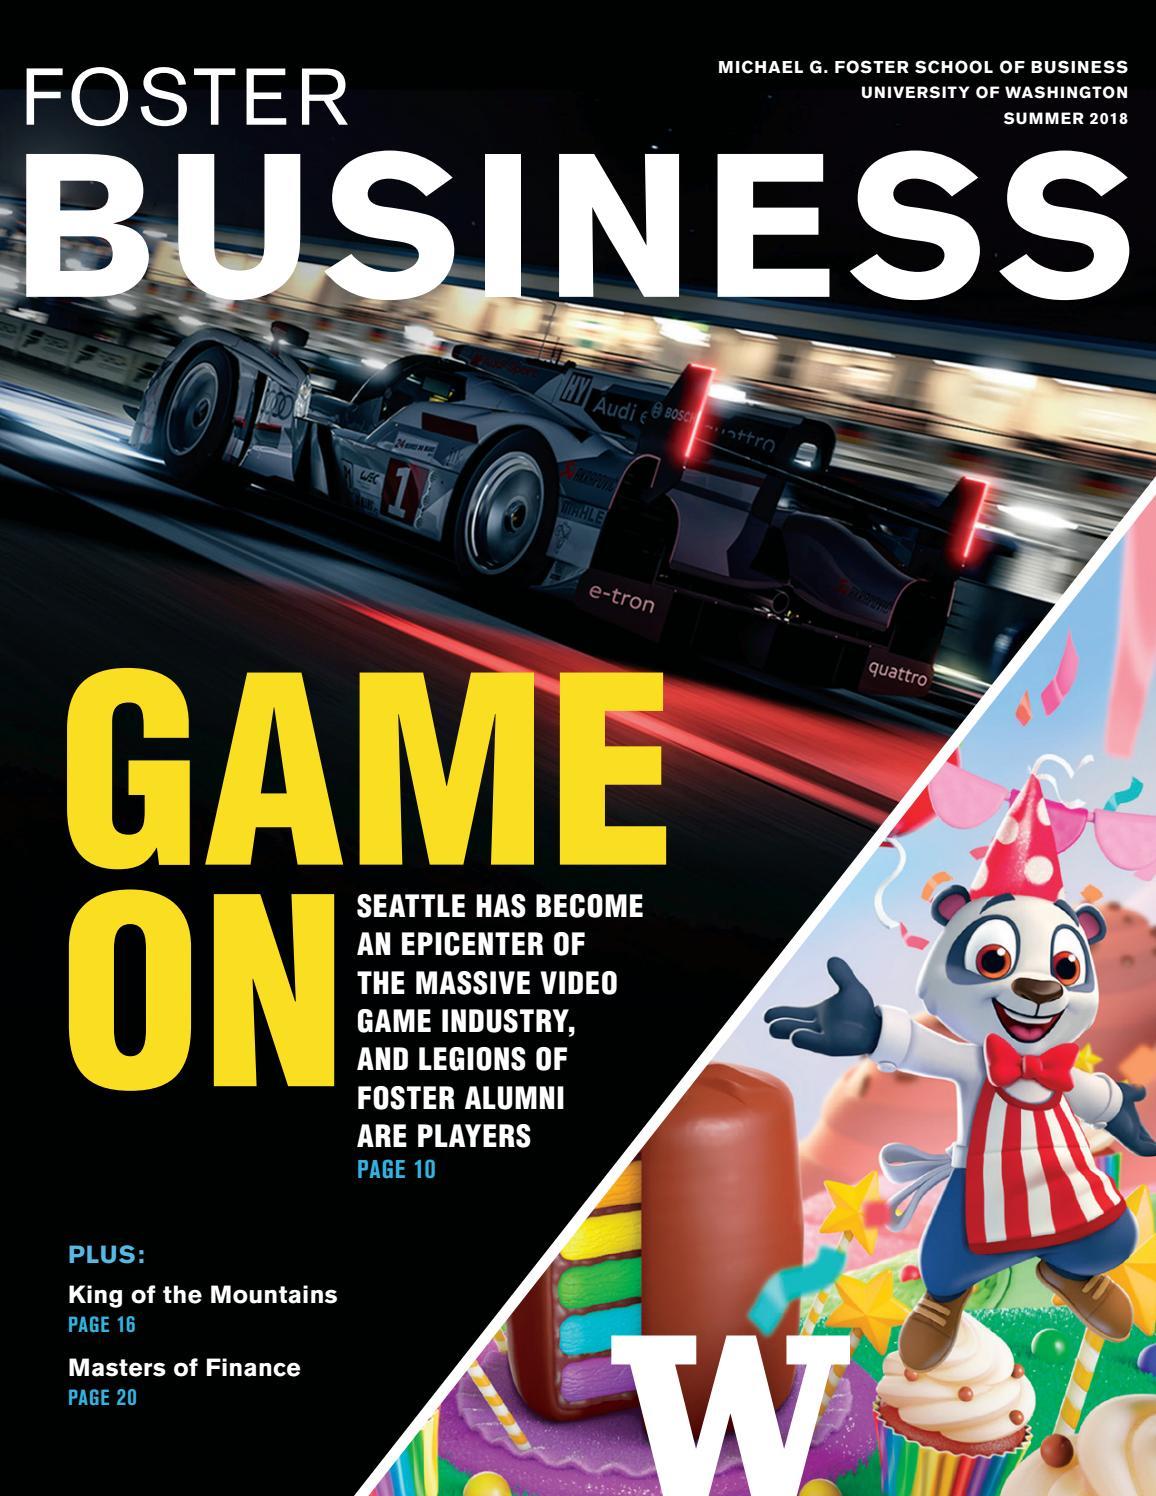 Foster Business Magazine Summer 2018 by University of Washington